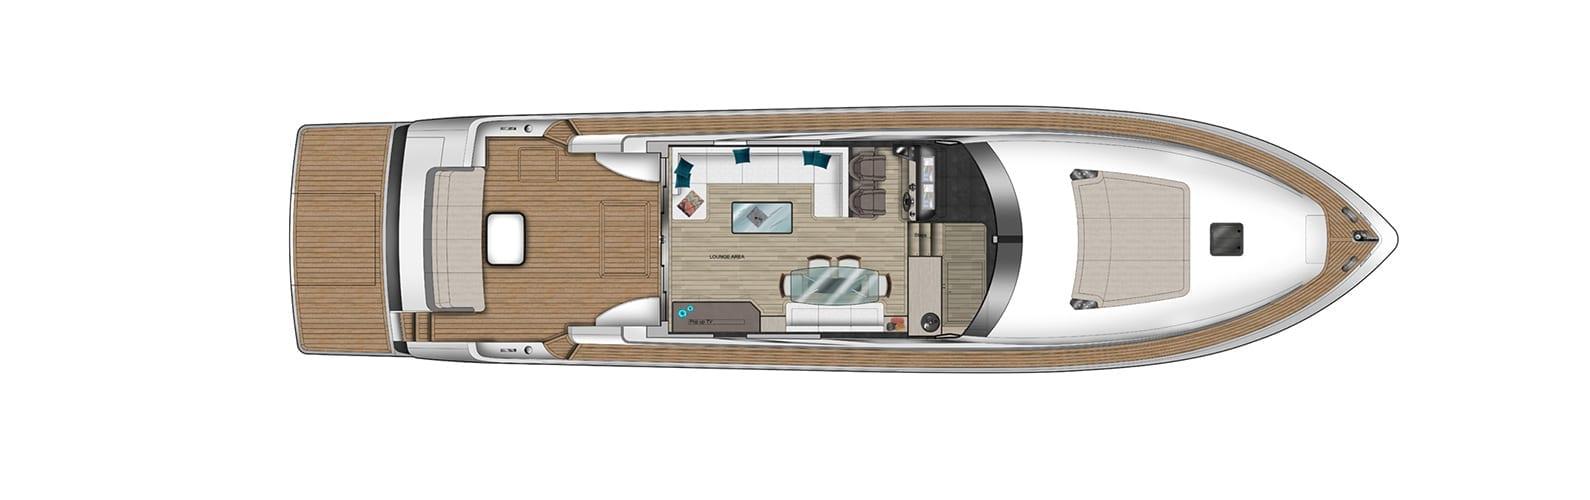 uniesse-ss-8-floor-plan-2